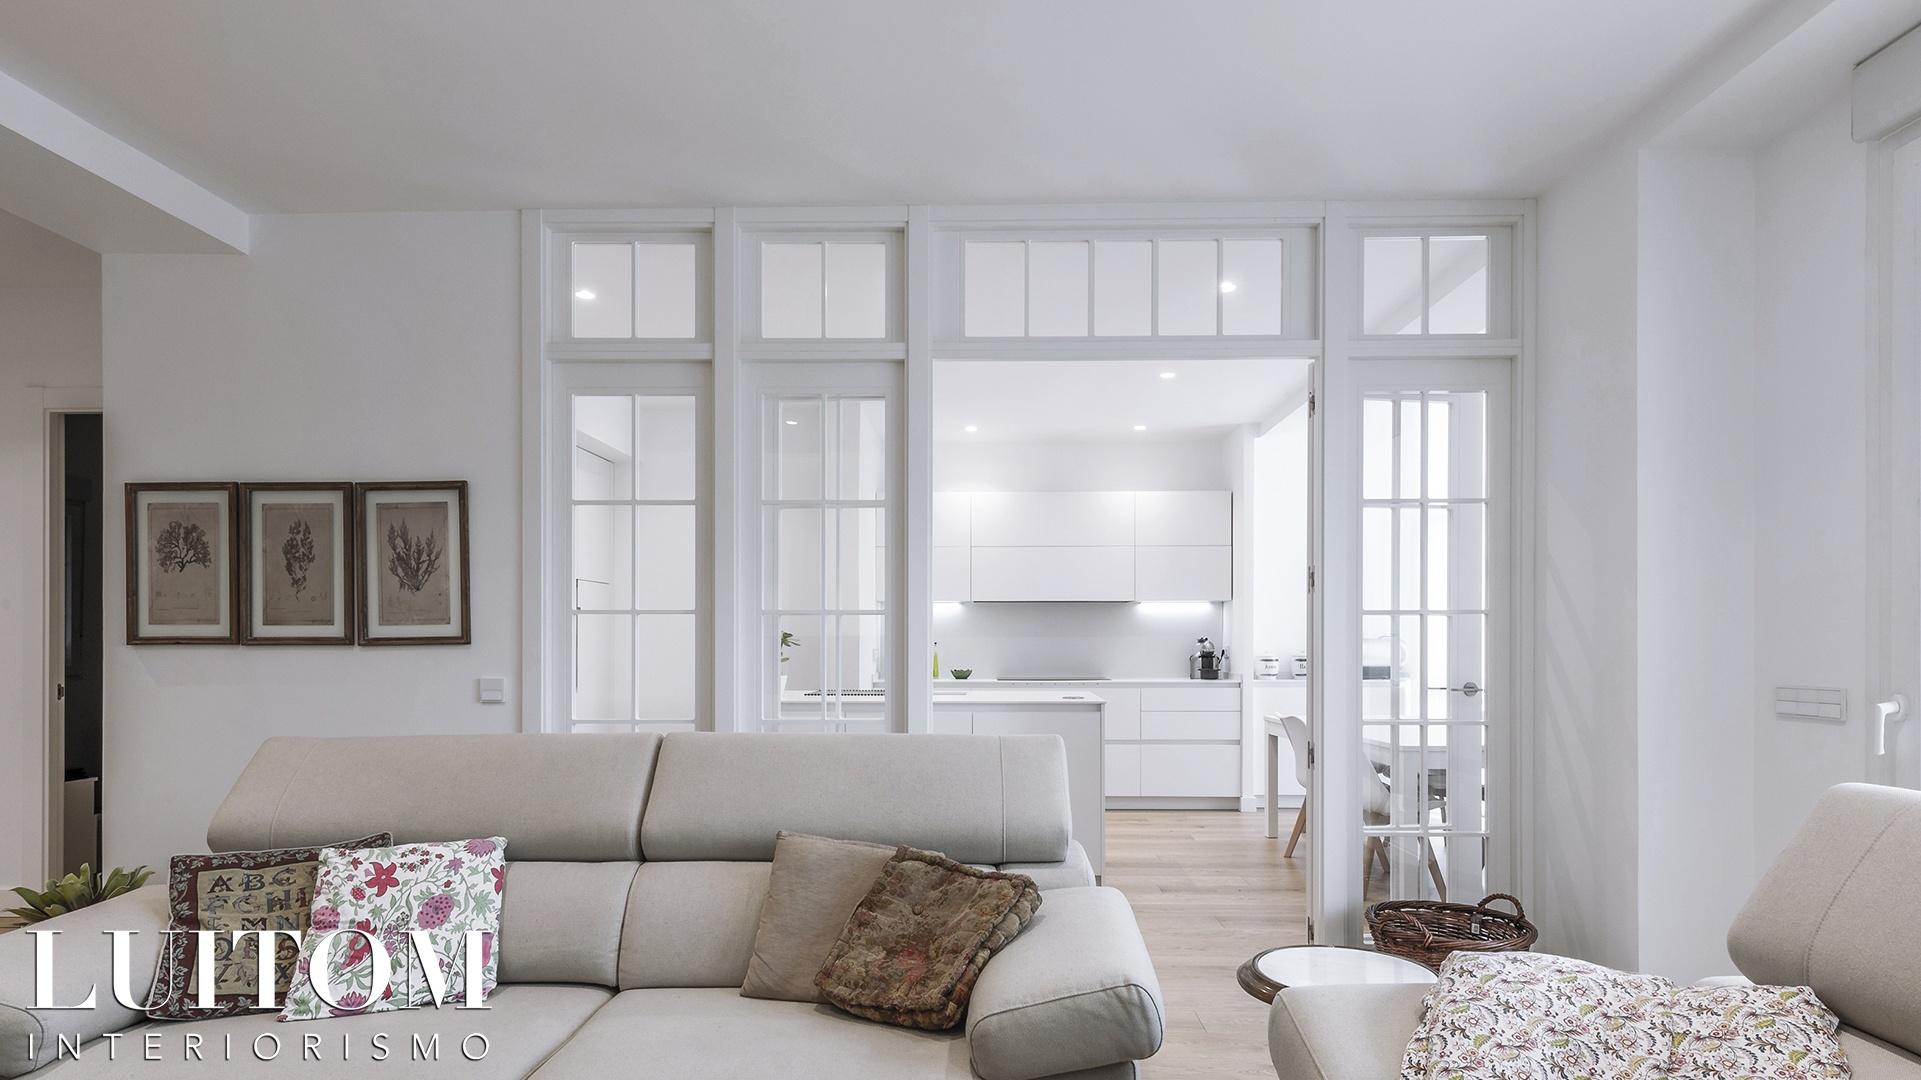 cristaleras-cocinas-pared-cristal-separacion-cocina-salon-cristalera-metalica-madera-blanca-negra-10